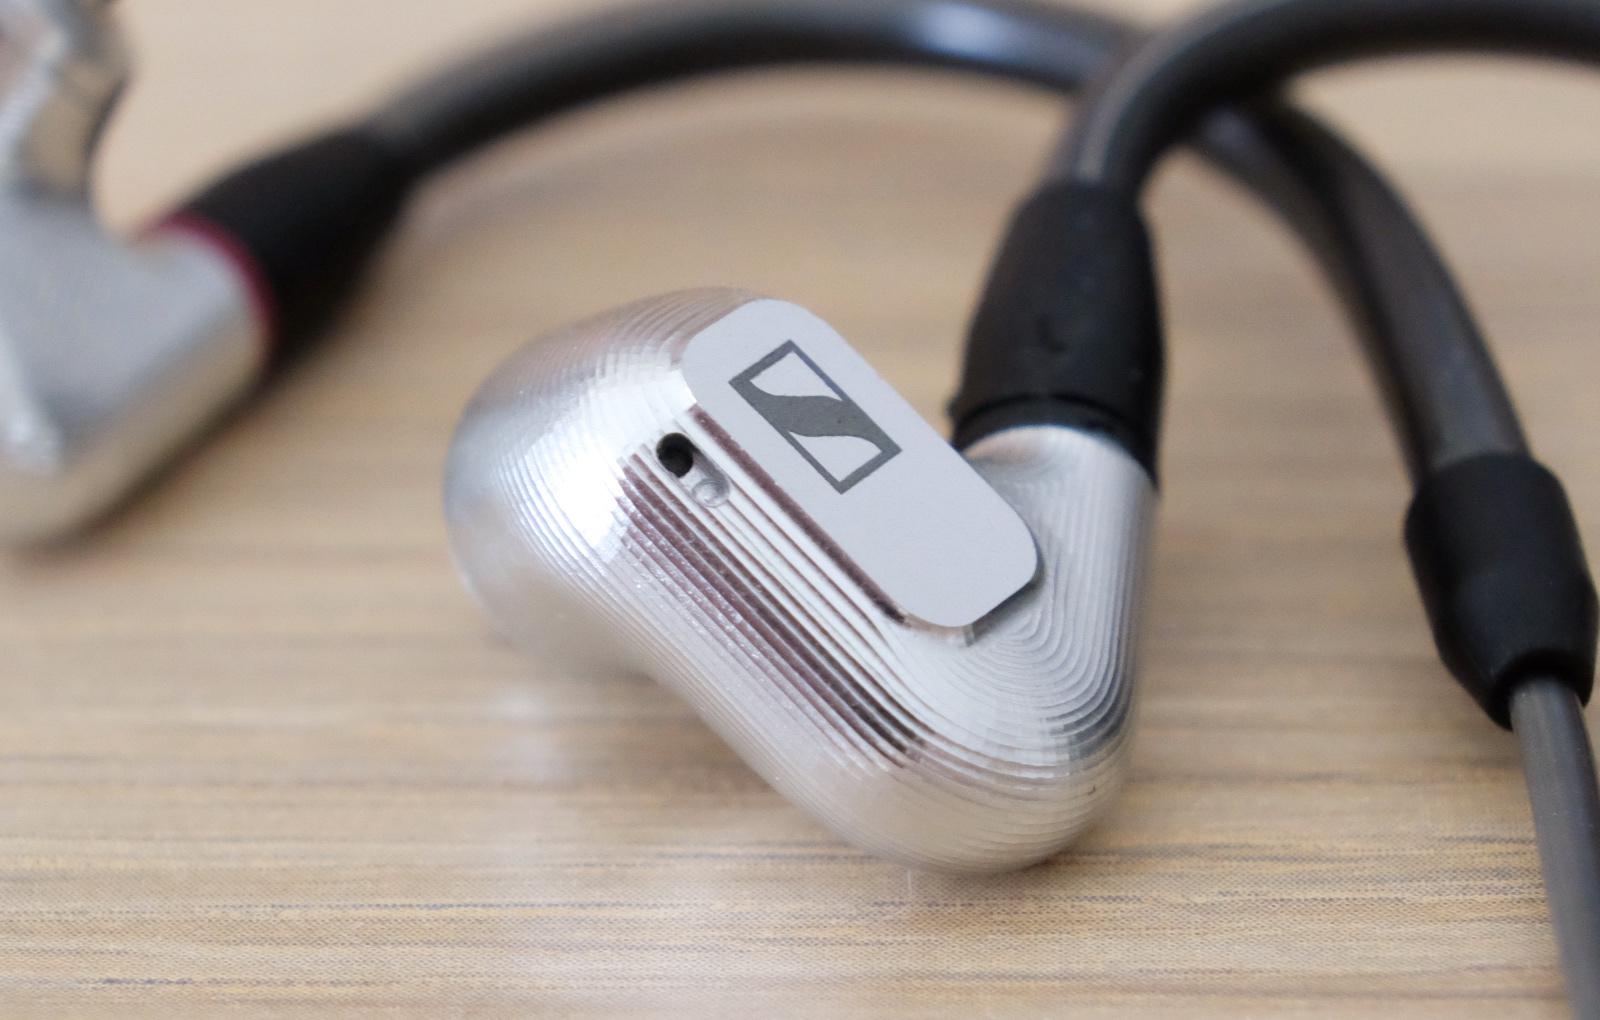 https://www.hardwarezone.com.sg/review-sennheiser-ie900-iem-headphones-review-singapore-price/performance-comparisons-and-conclusion